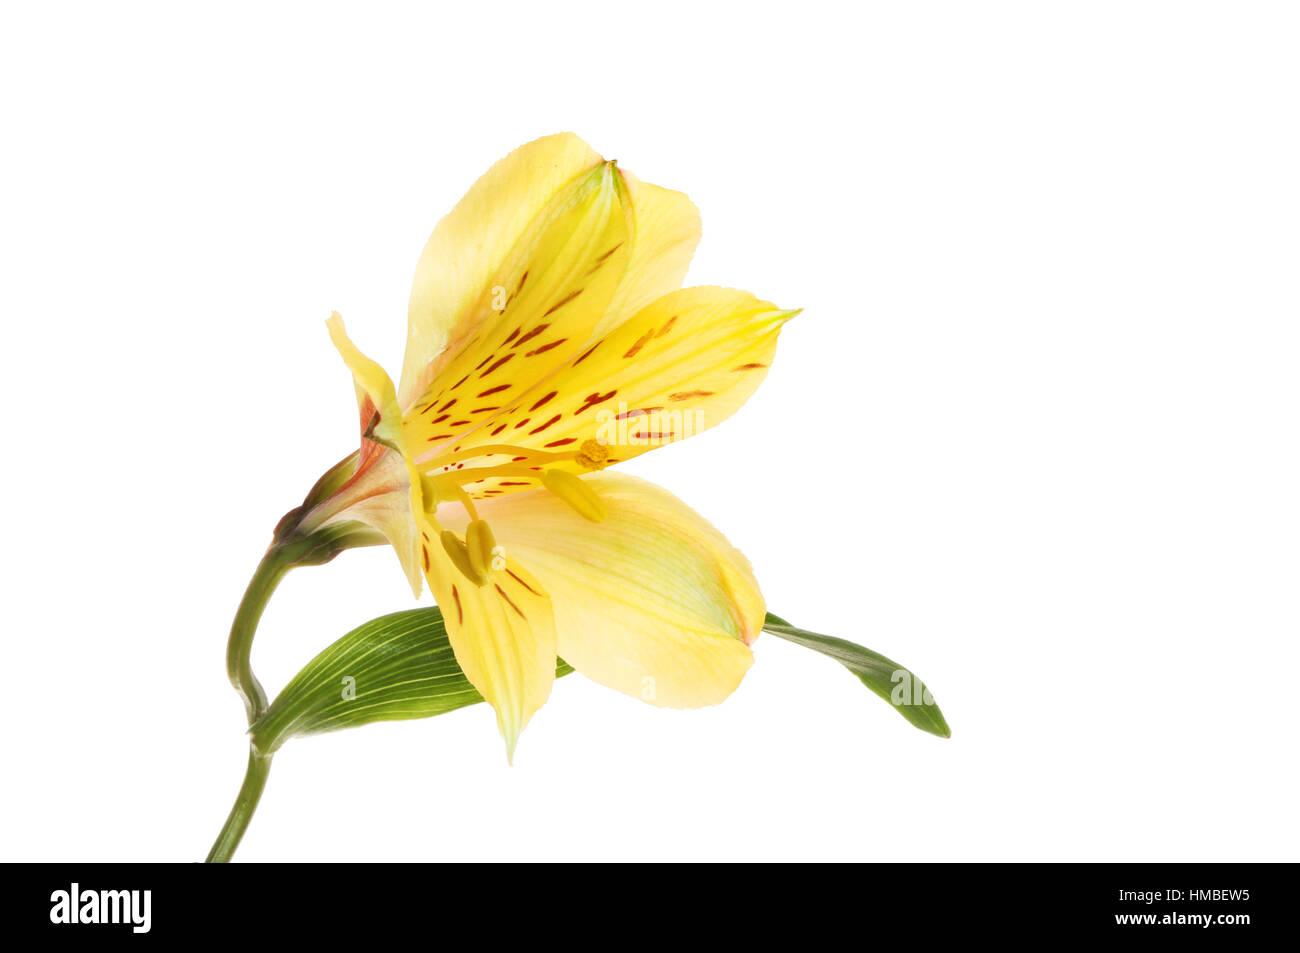 Yellow alstroemeria peruvian lily flower isolated against white yellow alstroemeria peruvian lily flower isolated against white izmirmasajfo Gallery